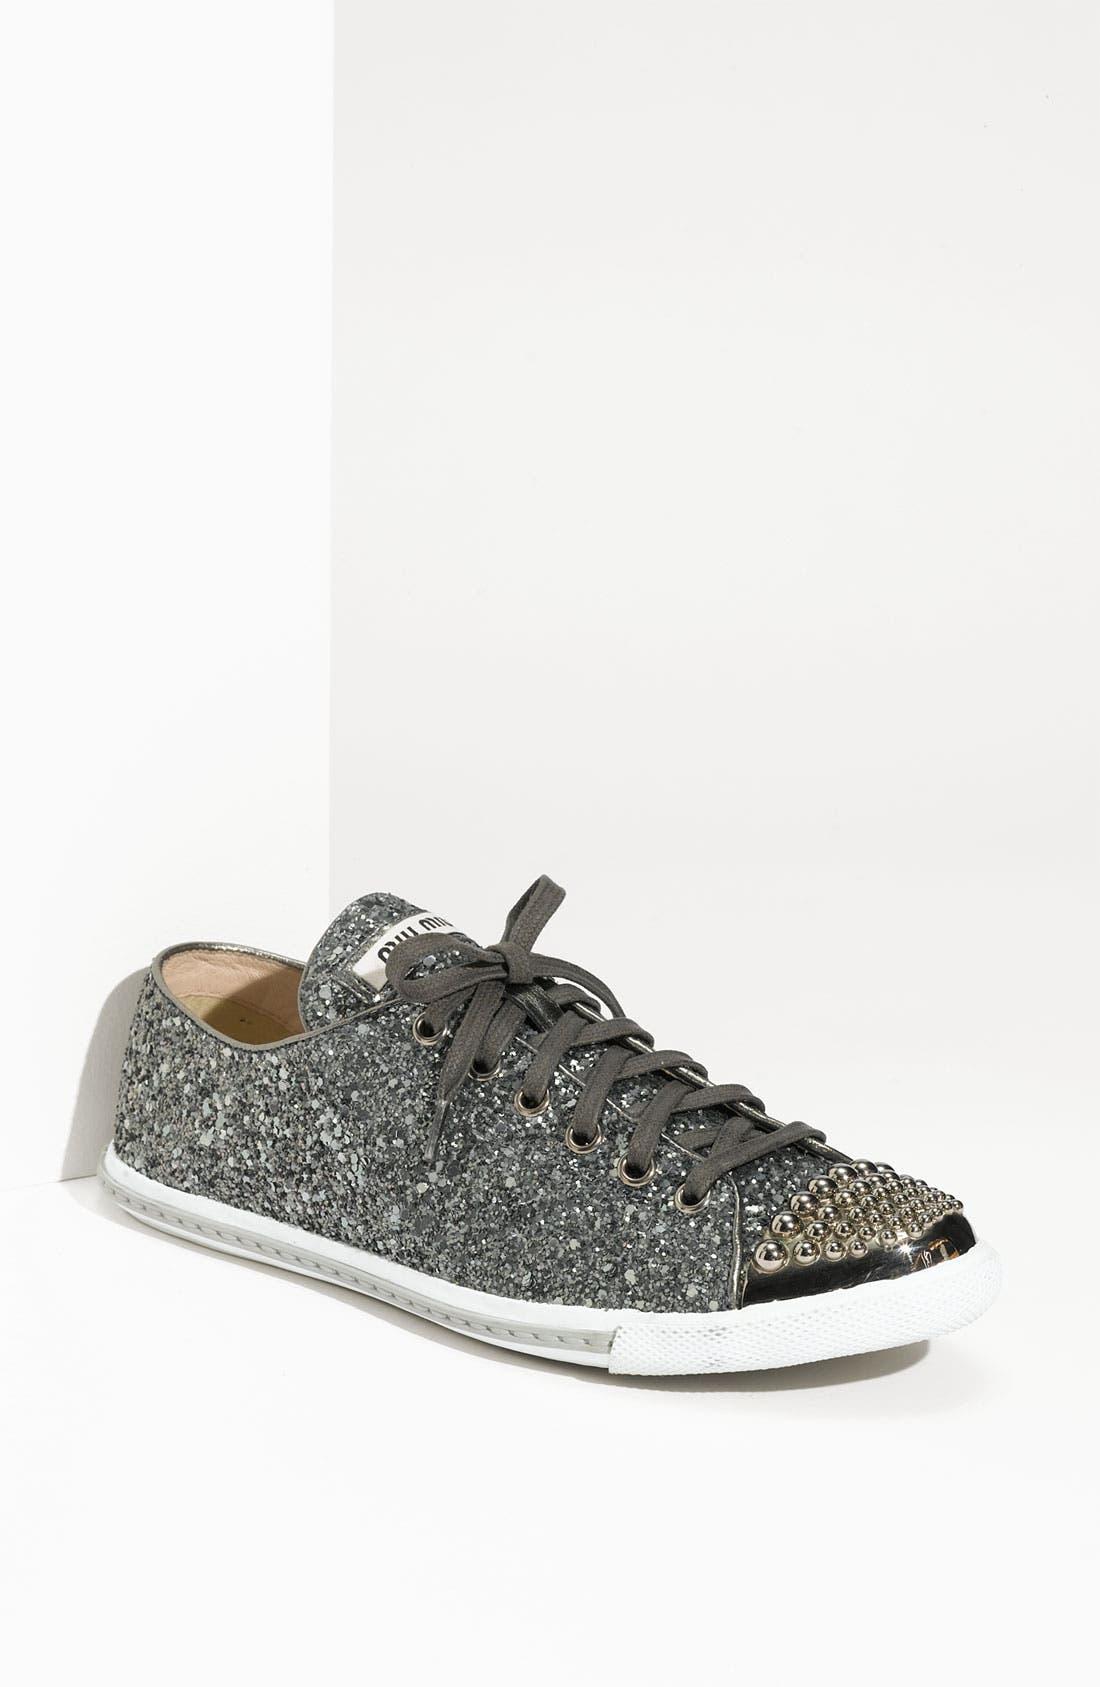 Alternate Image 1 Selected - Miu Miu Glitter Sneaker